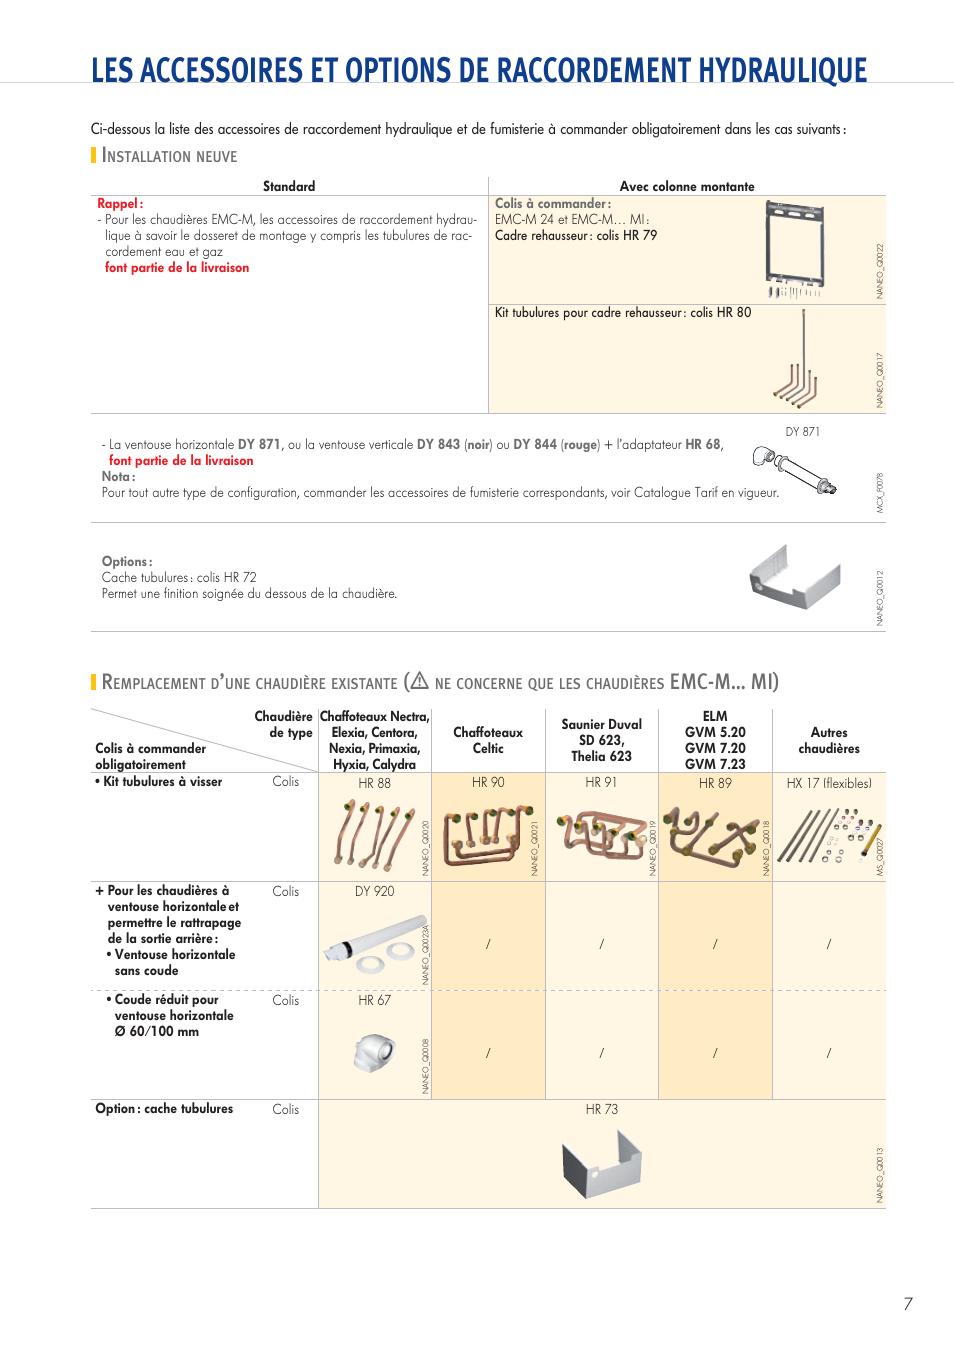 installation neuve emc m mi de dietrich naneo manuel d 39 utilisation page 7 12. Black Bedroom Furniture Sets. Home Design Ideas